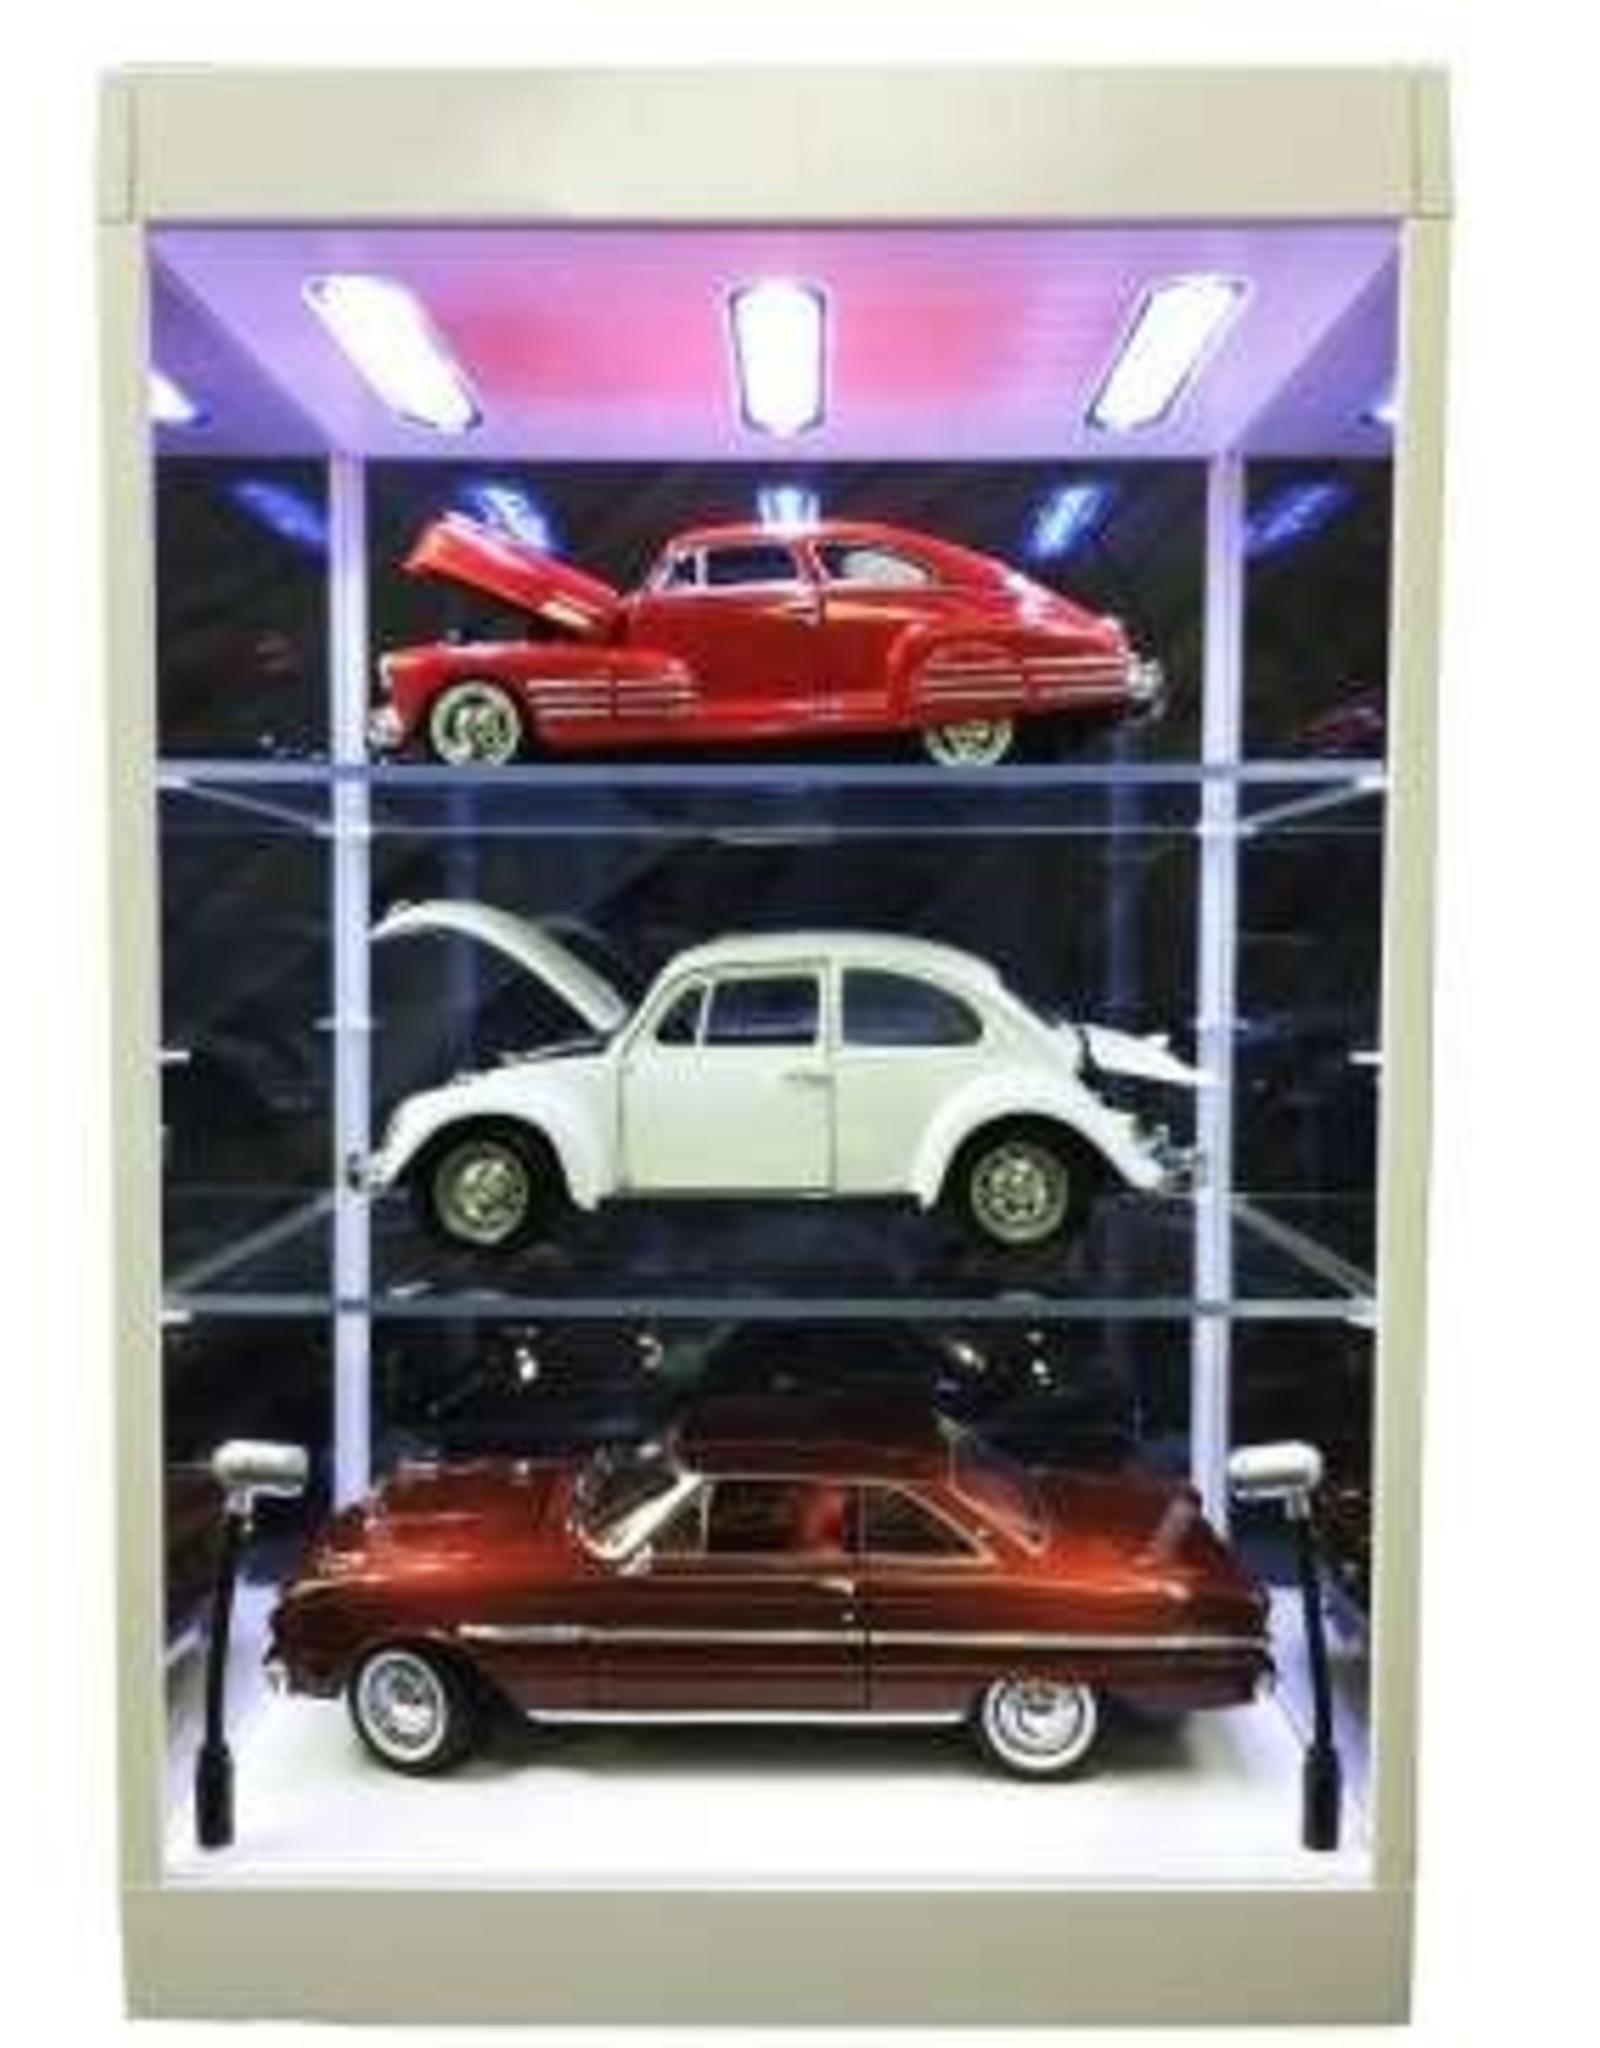 Linkwow LED Lighted Display Case - 2 Adjustable Shelves - Linkwow